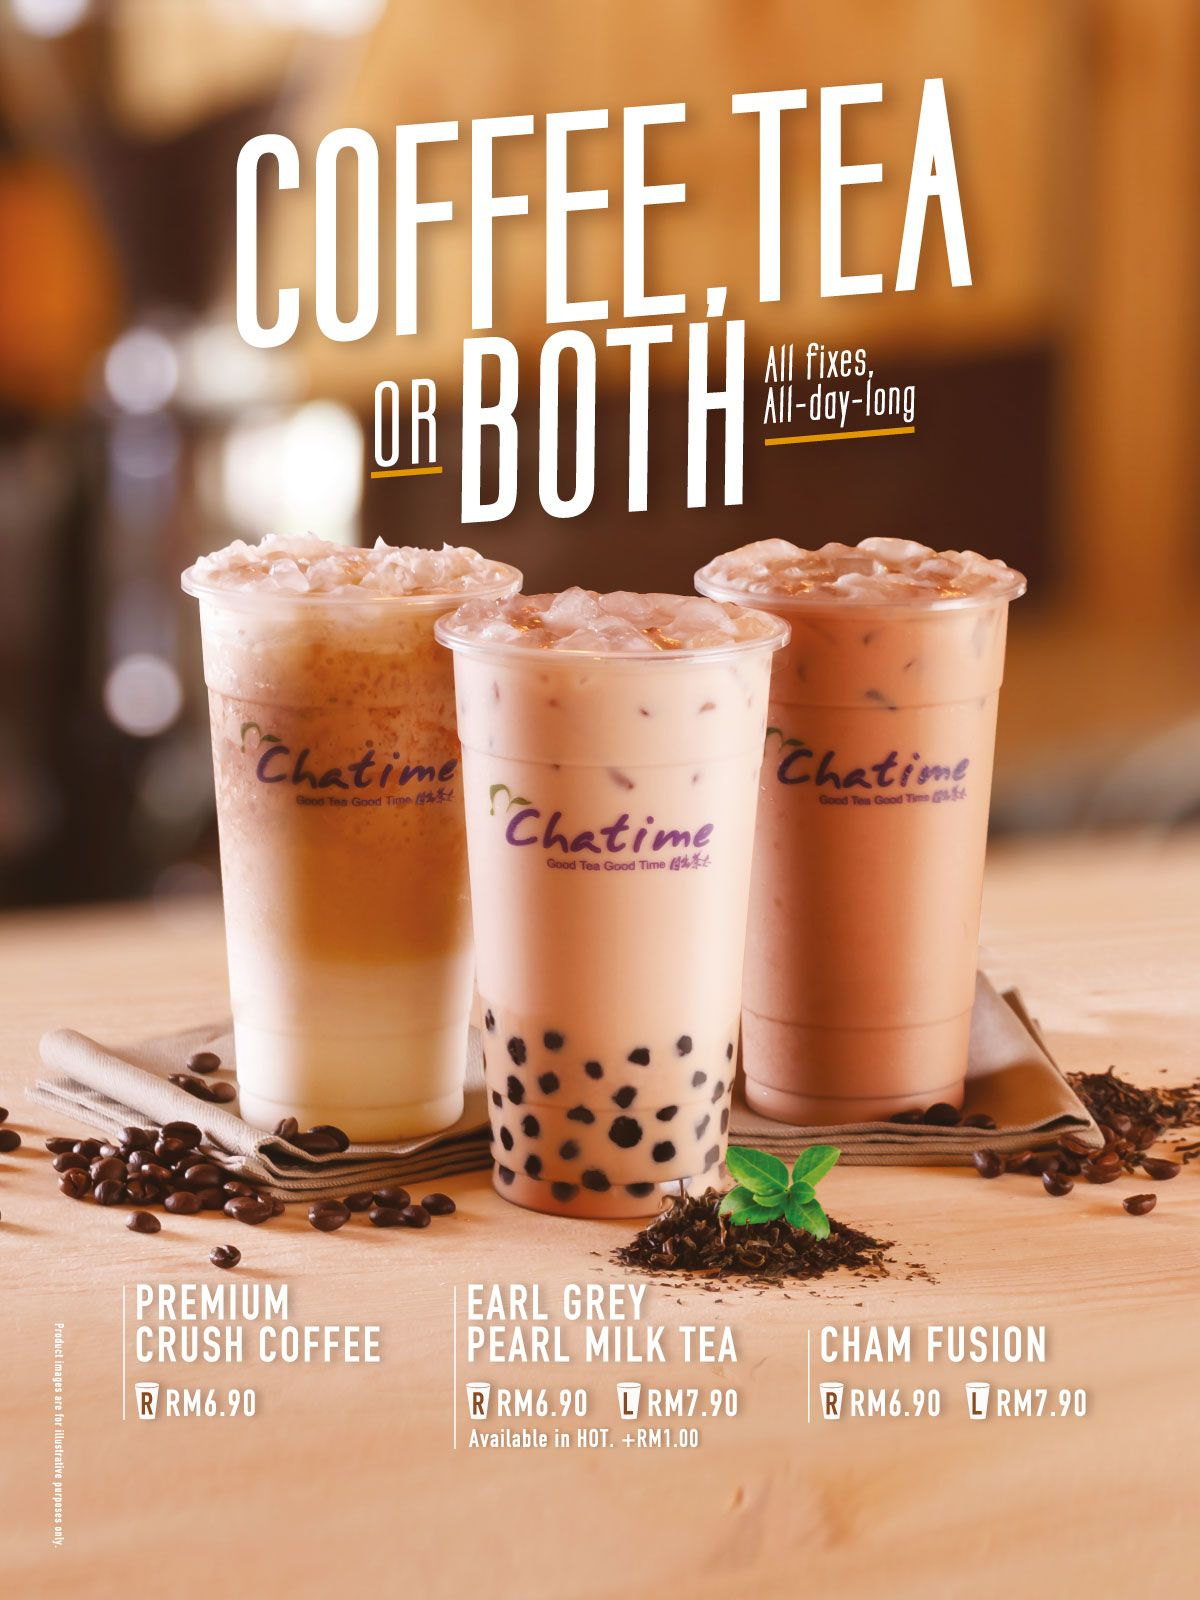 Coffee, Tea OR Both! New Series VarieTea CHATIME